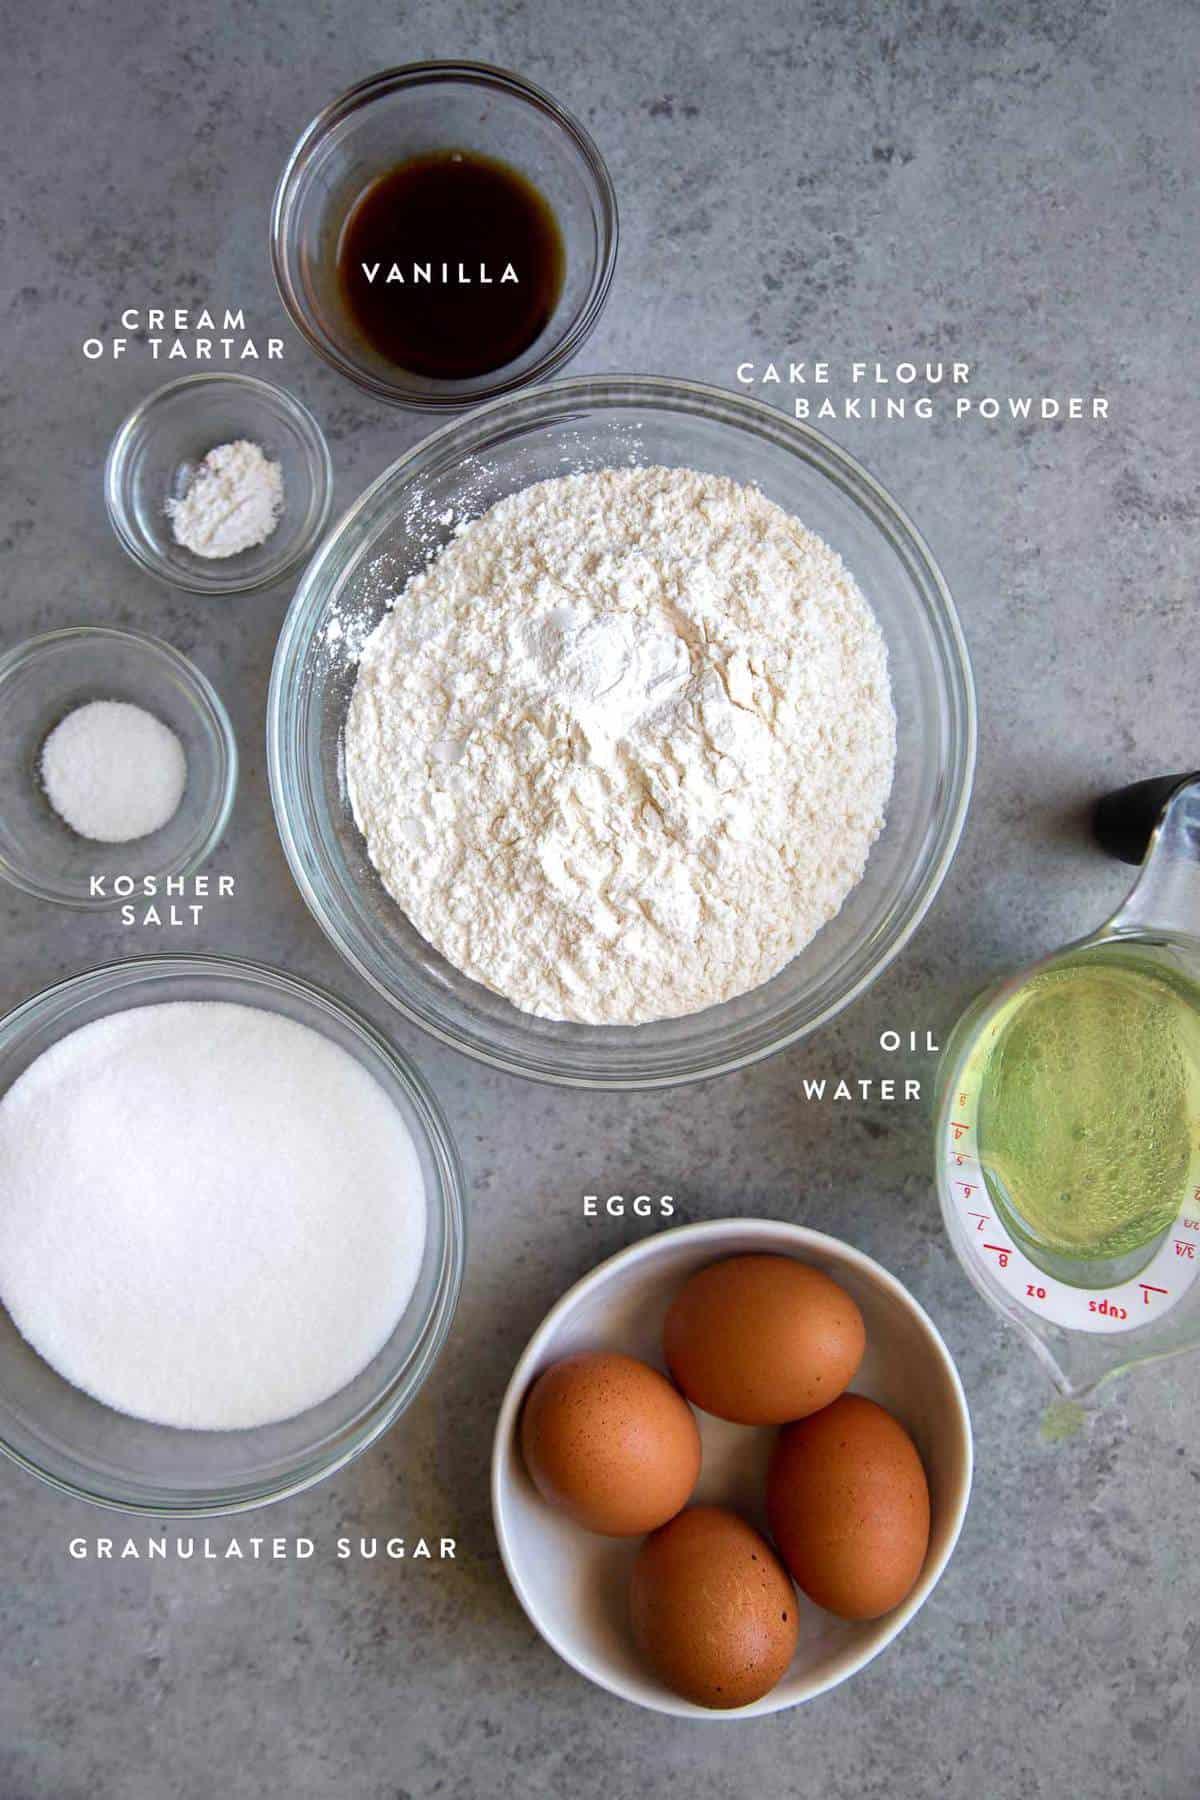 Vanilla Sponge Cake ingredients